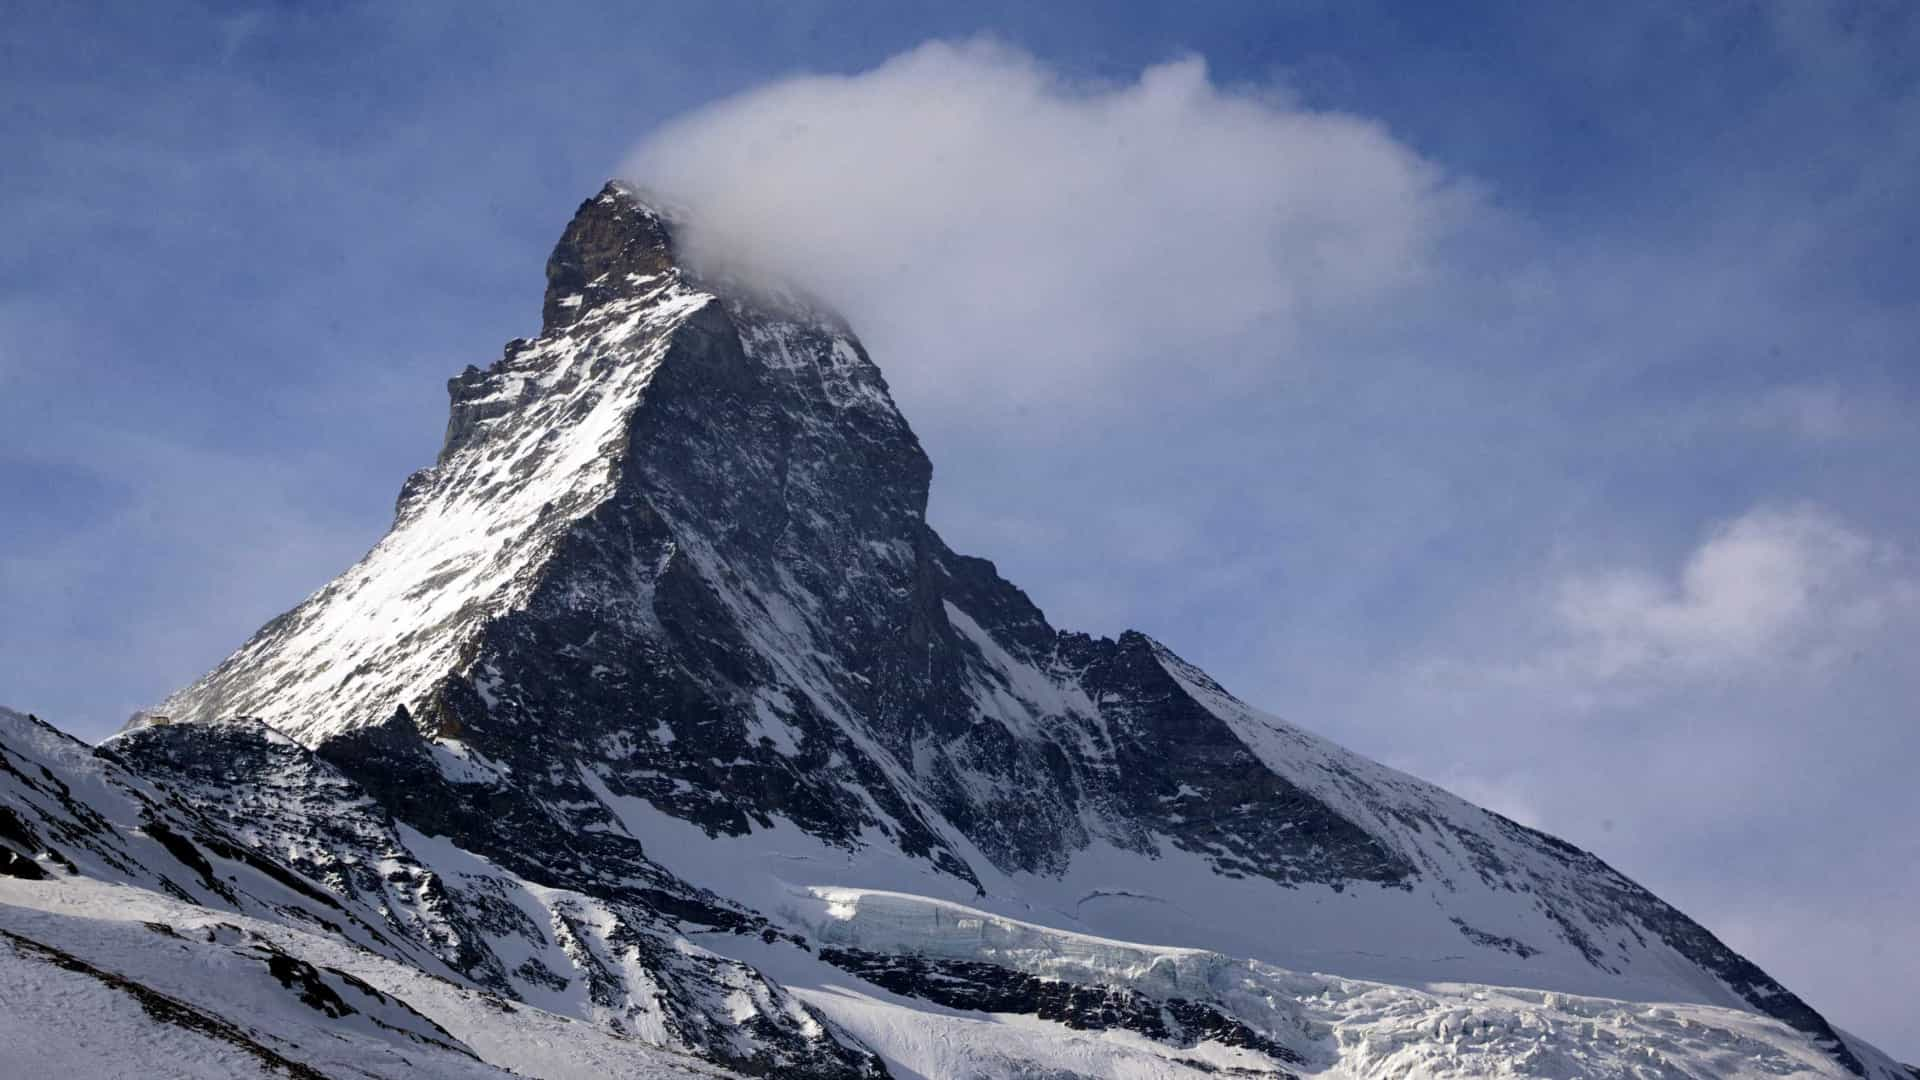 Vídeo mostra avalanche soterrando vários esquiadores na Suíça